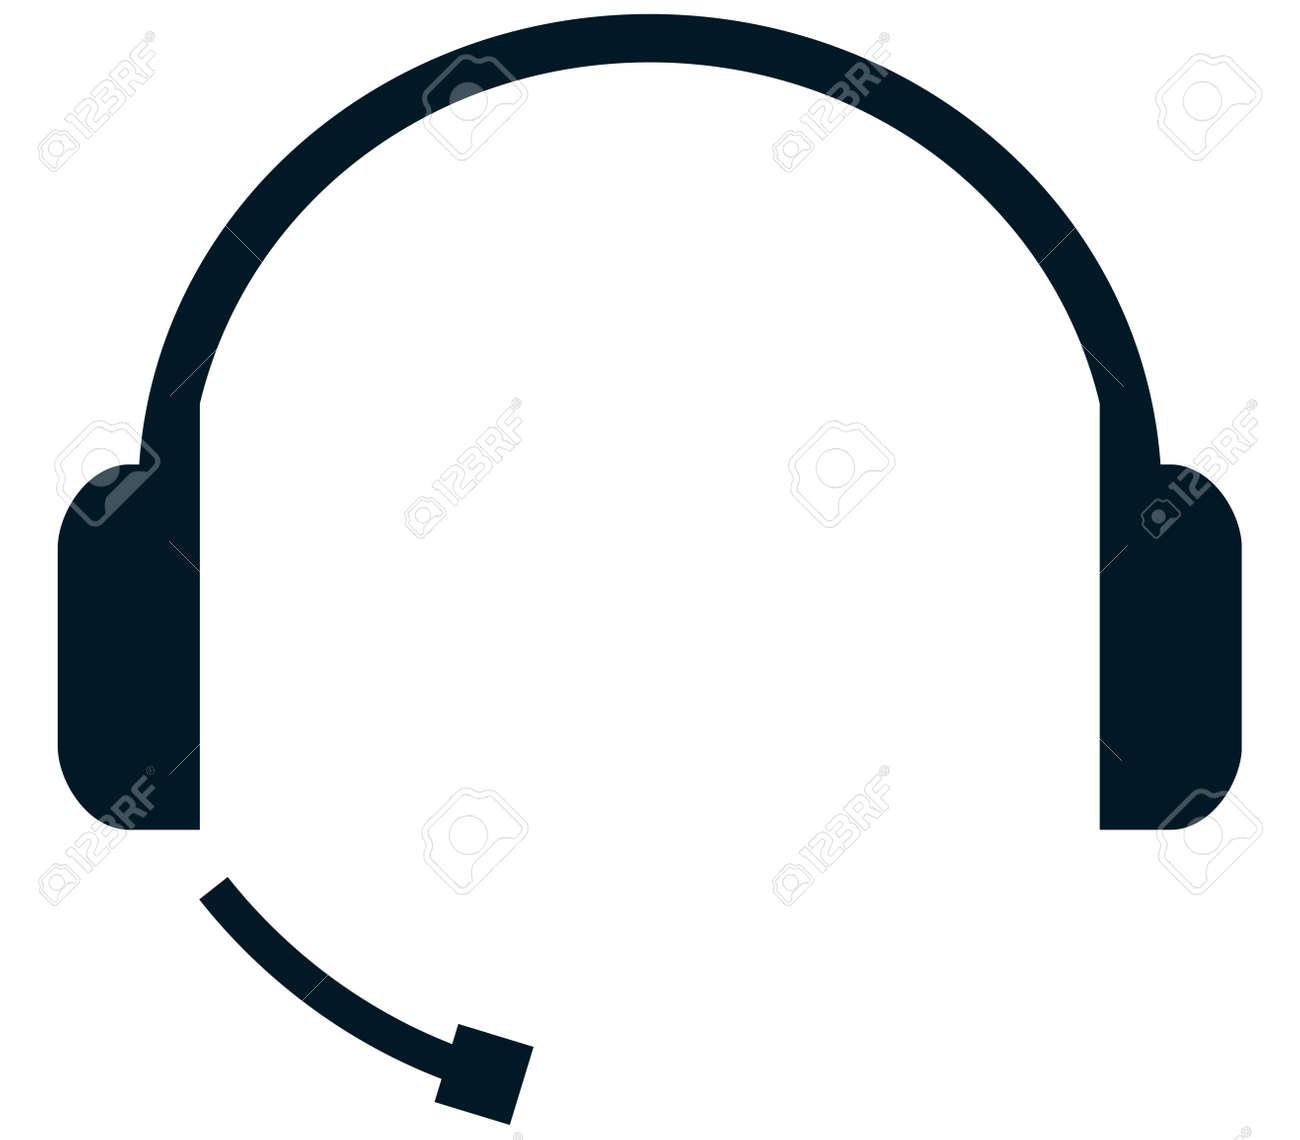 Headset handsfree headphones mic microphone vector isolated - 43889956